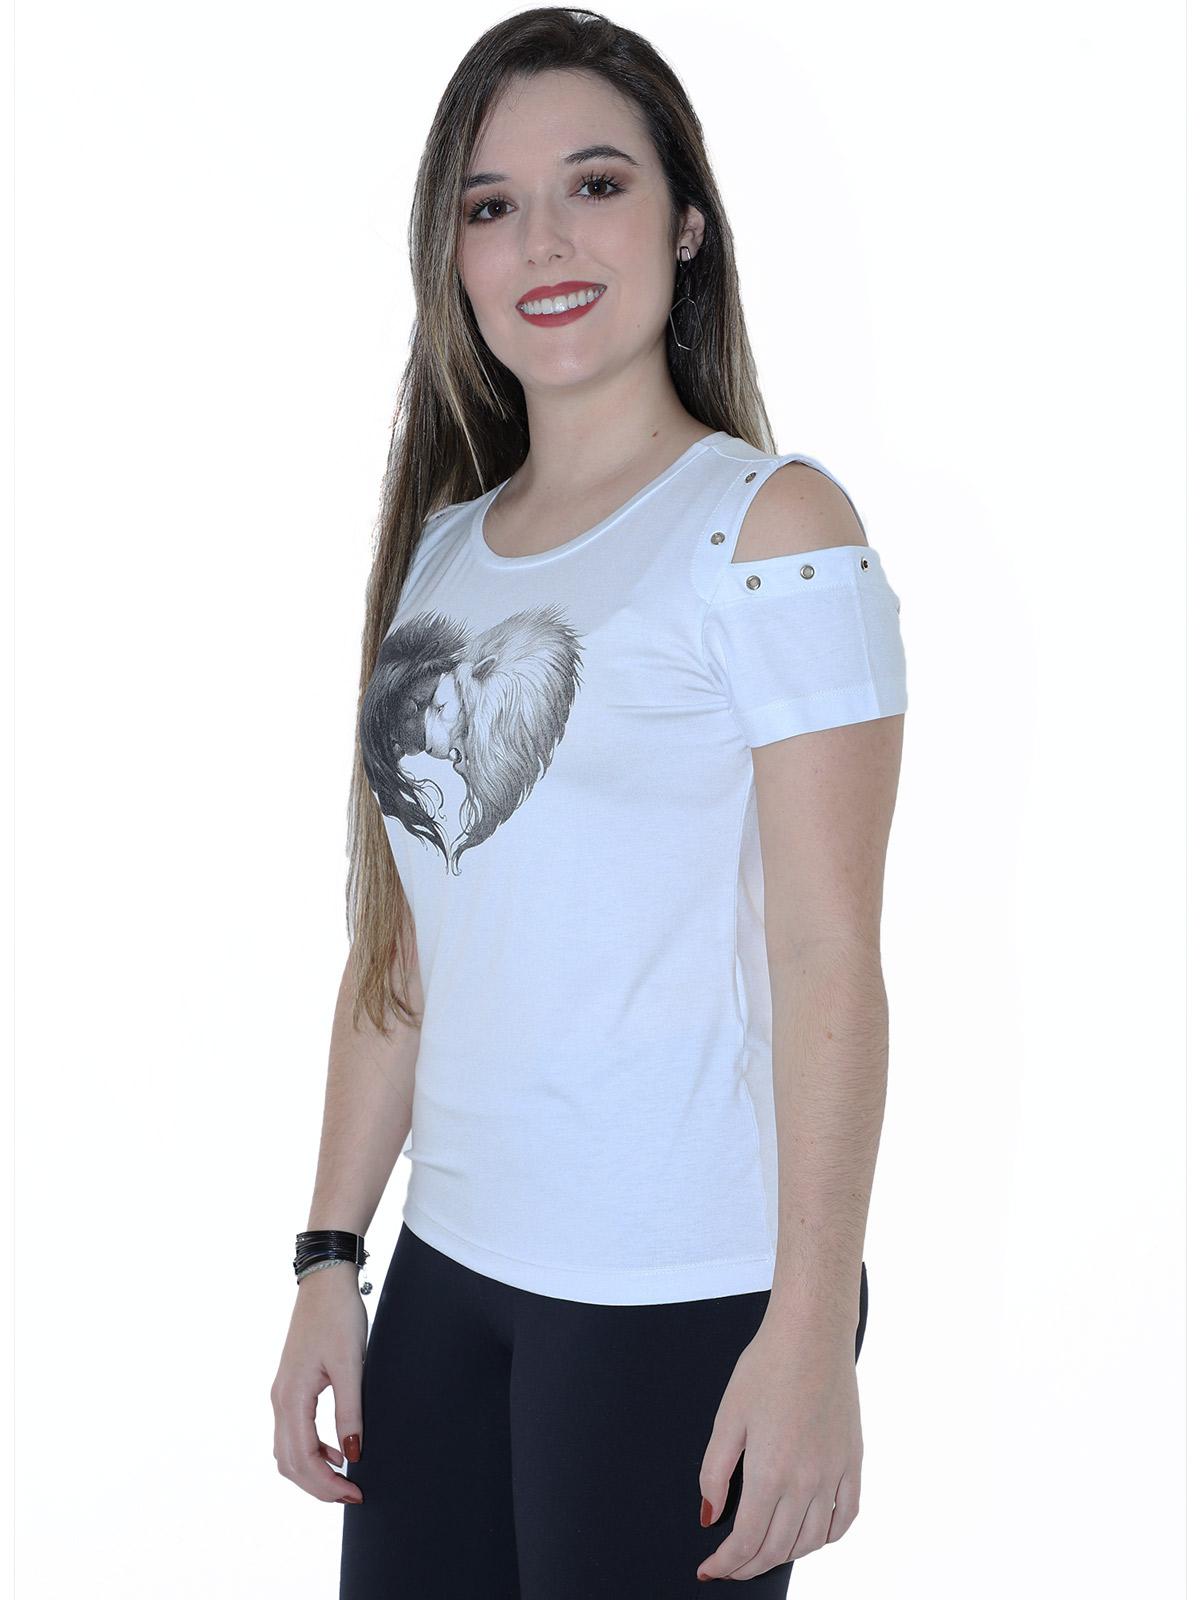 Blusa Feminina Longuete Viscolycra Manga Curta Ombro com Ilhós Branca